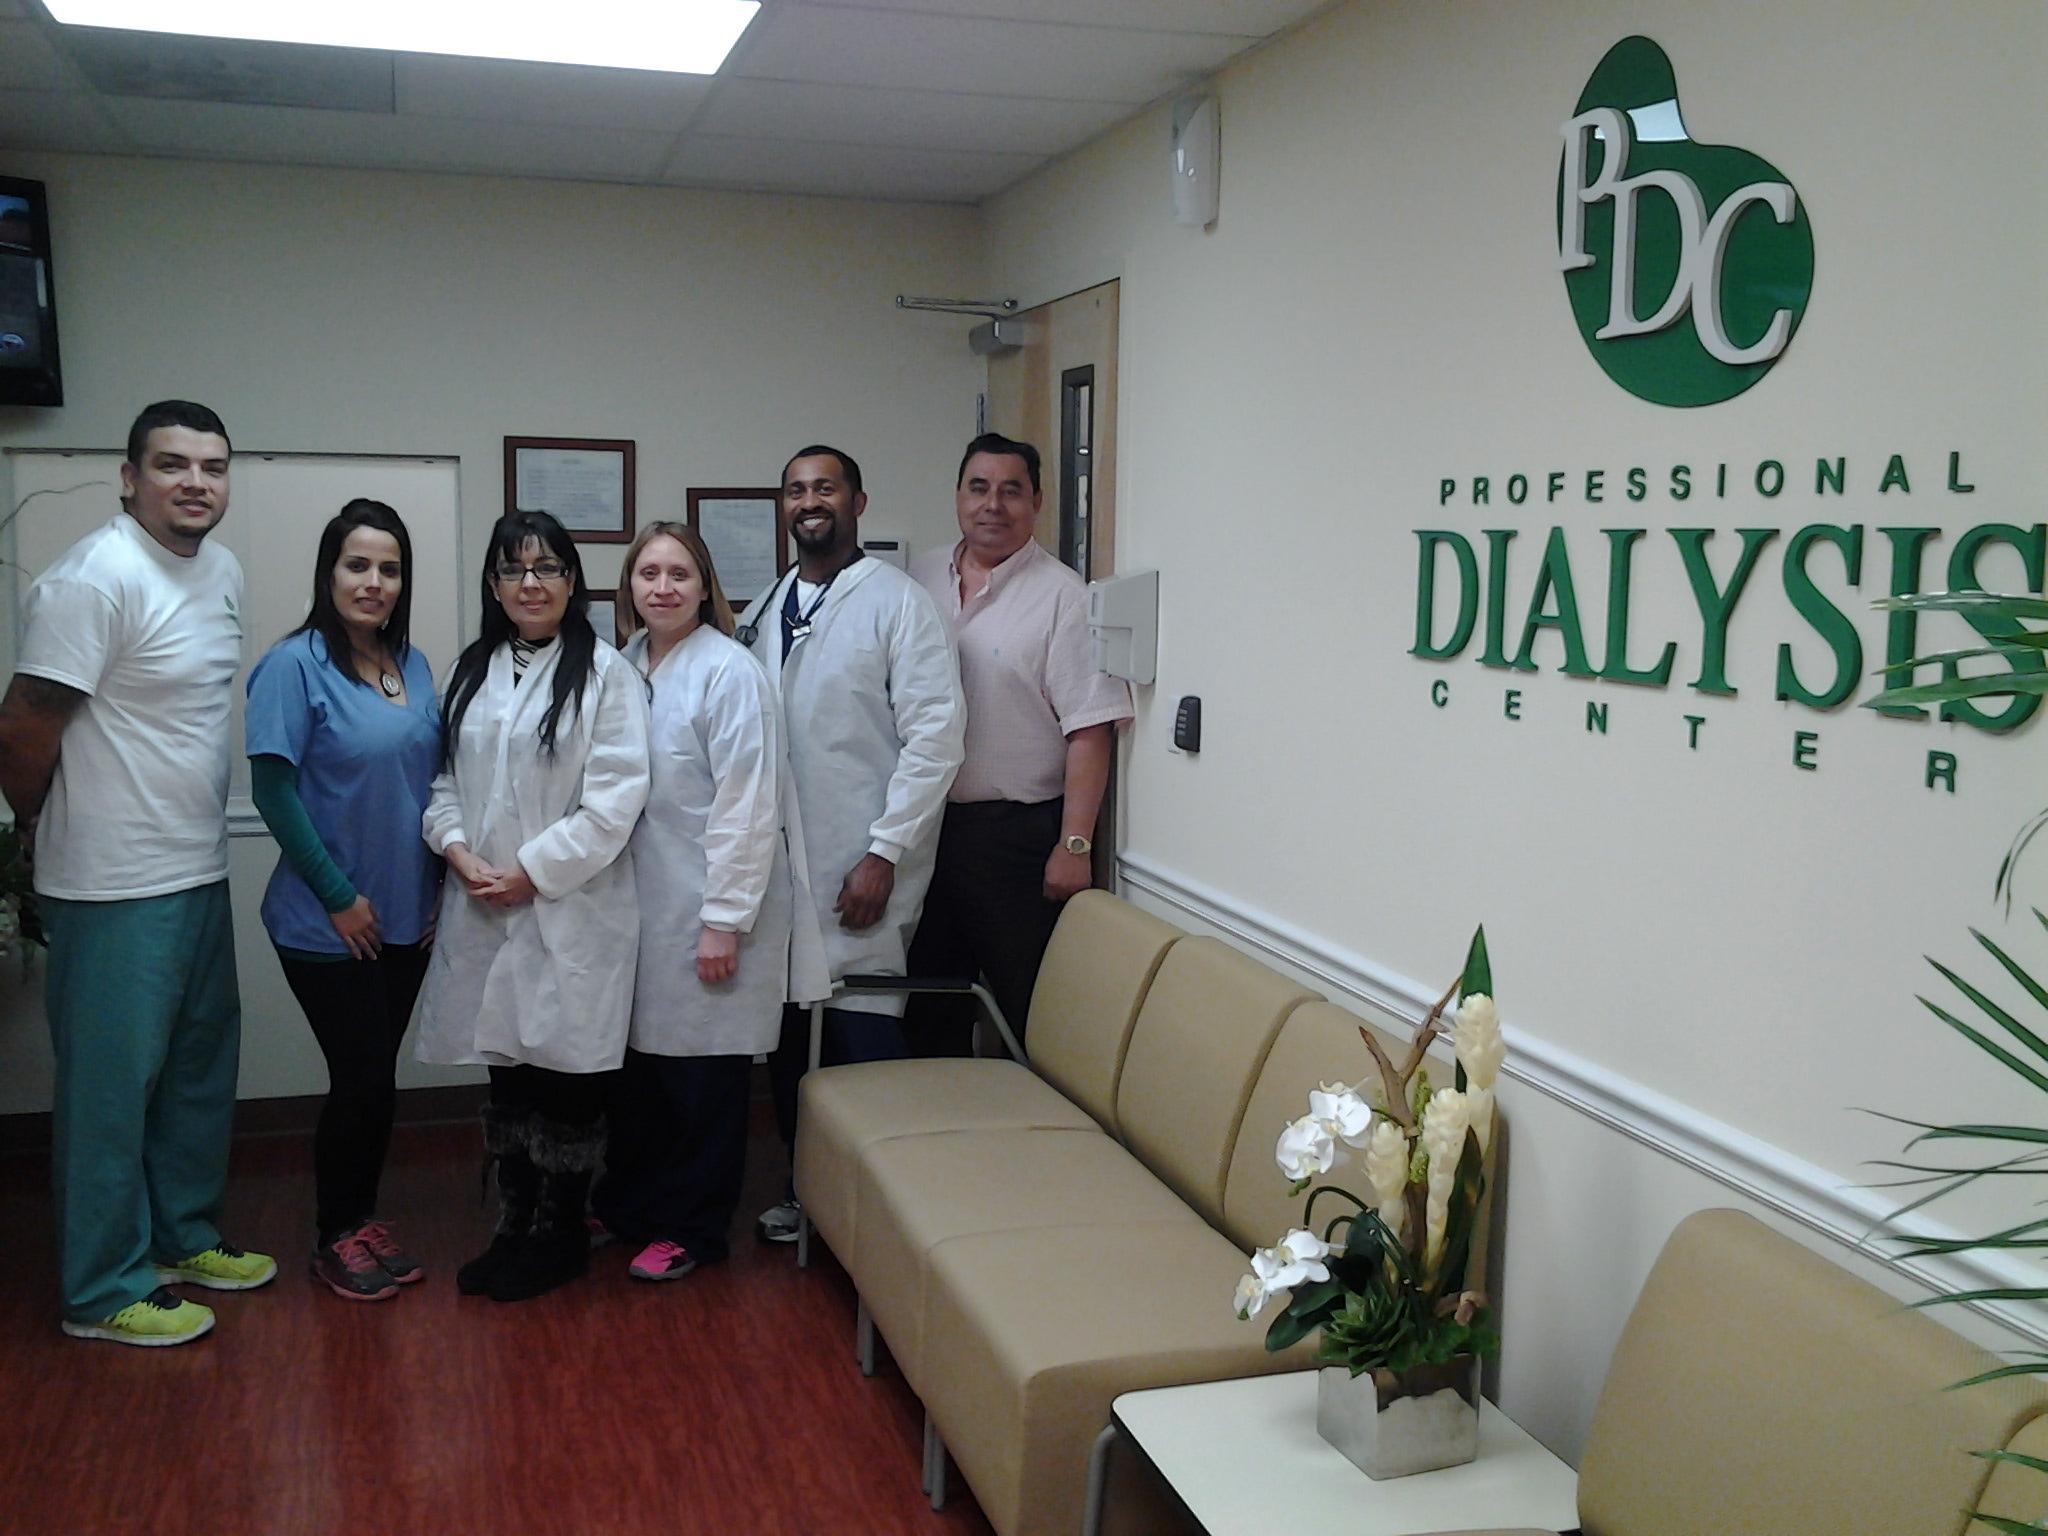 Brindis de apertura del Professional Dialysis Center en Pembroke Pines